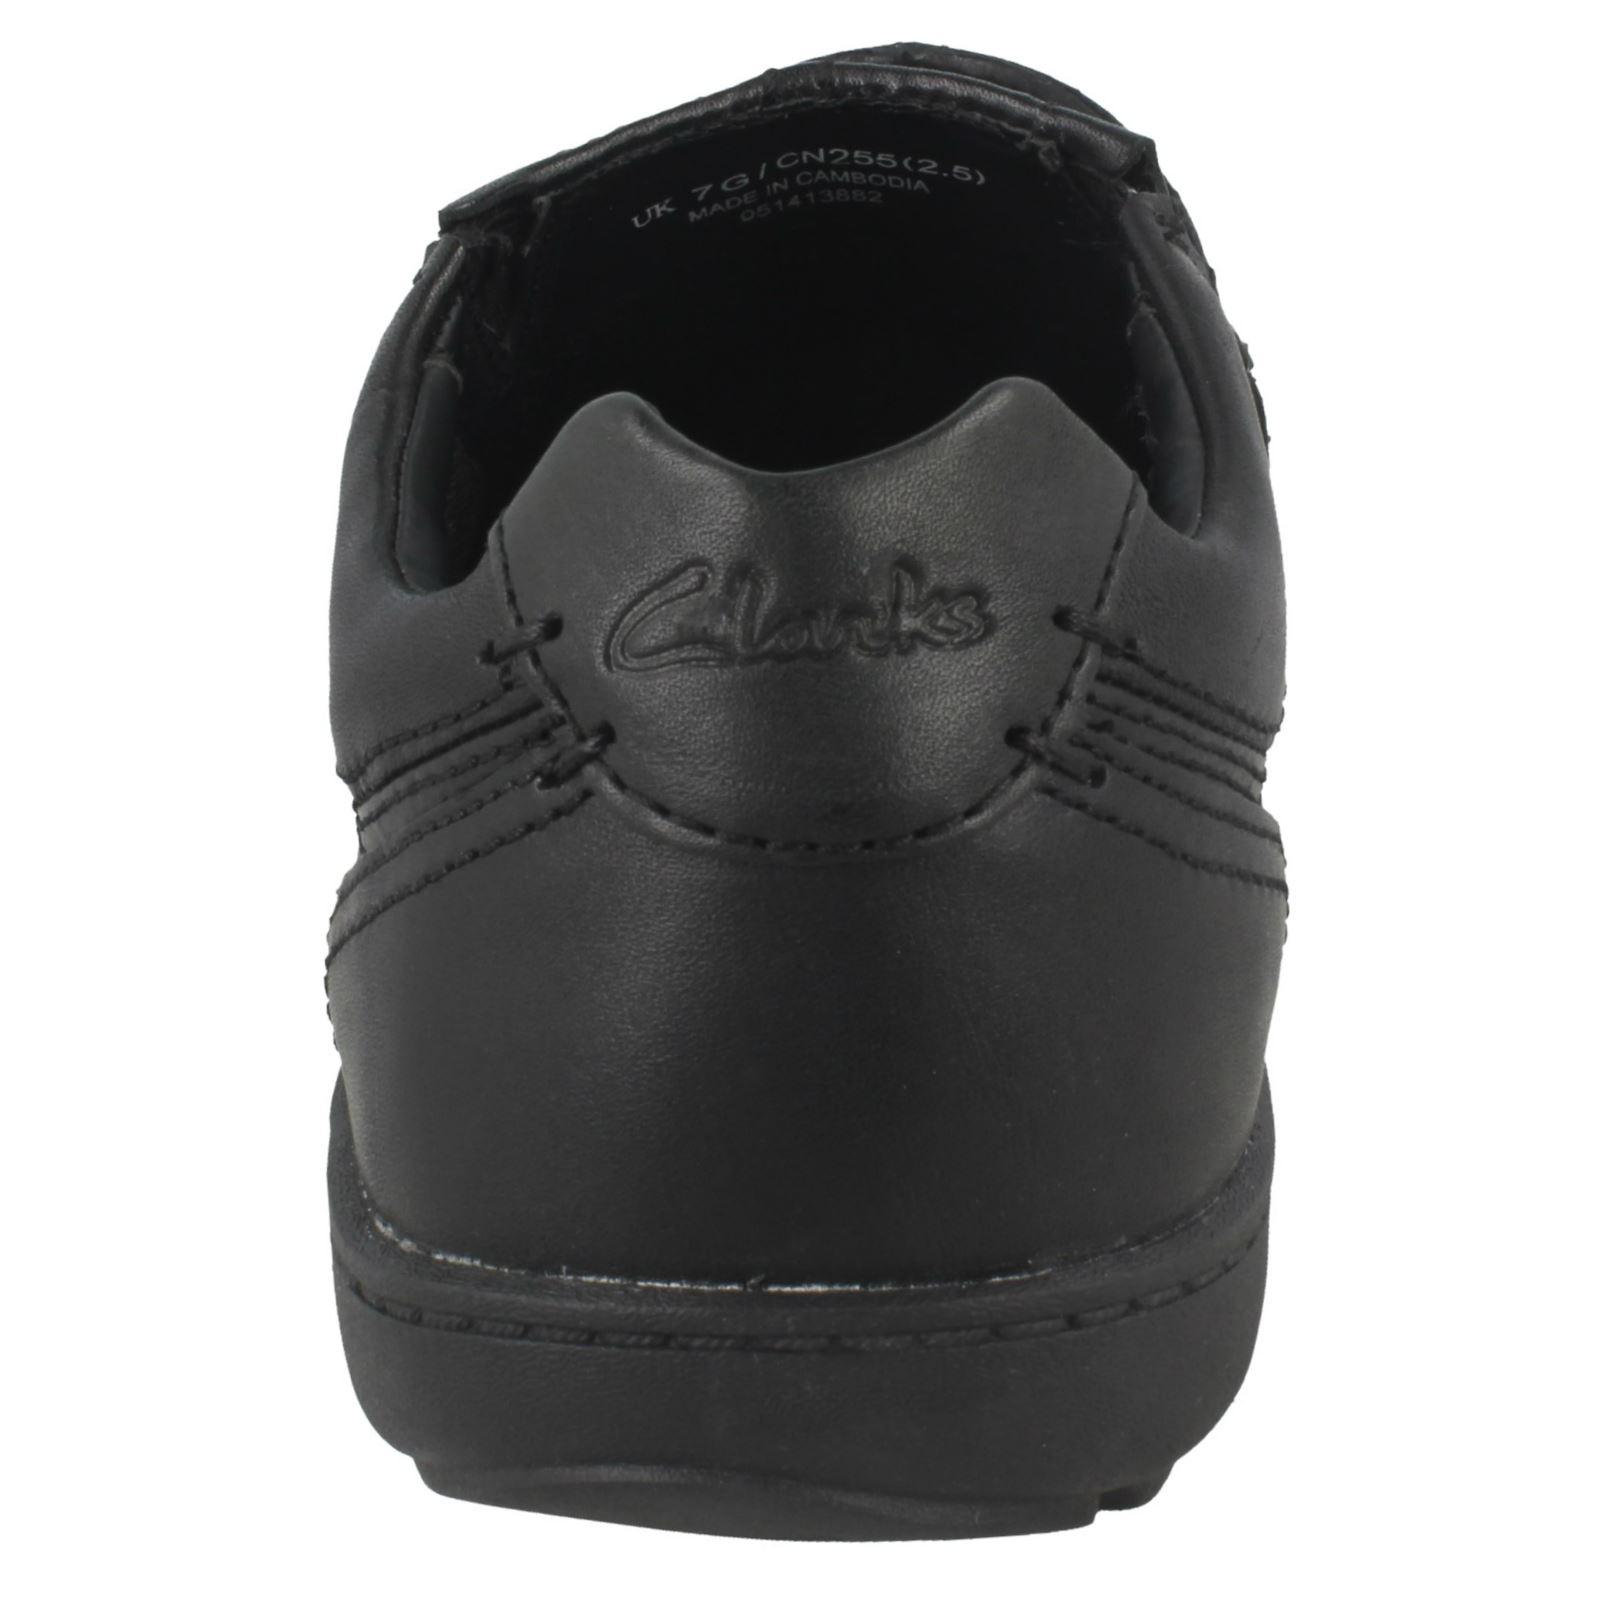 Uomo Clarks Formal Cushioned Schuhes Slip On Quality Leder Schuhes Cushioned Bradley Fall b7ae4a